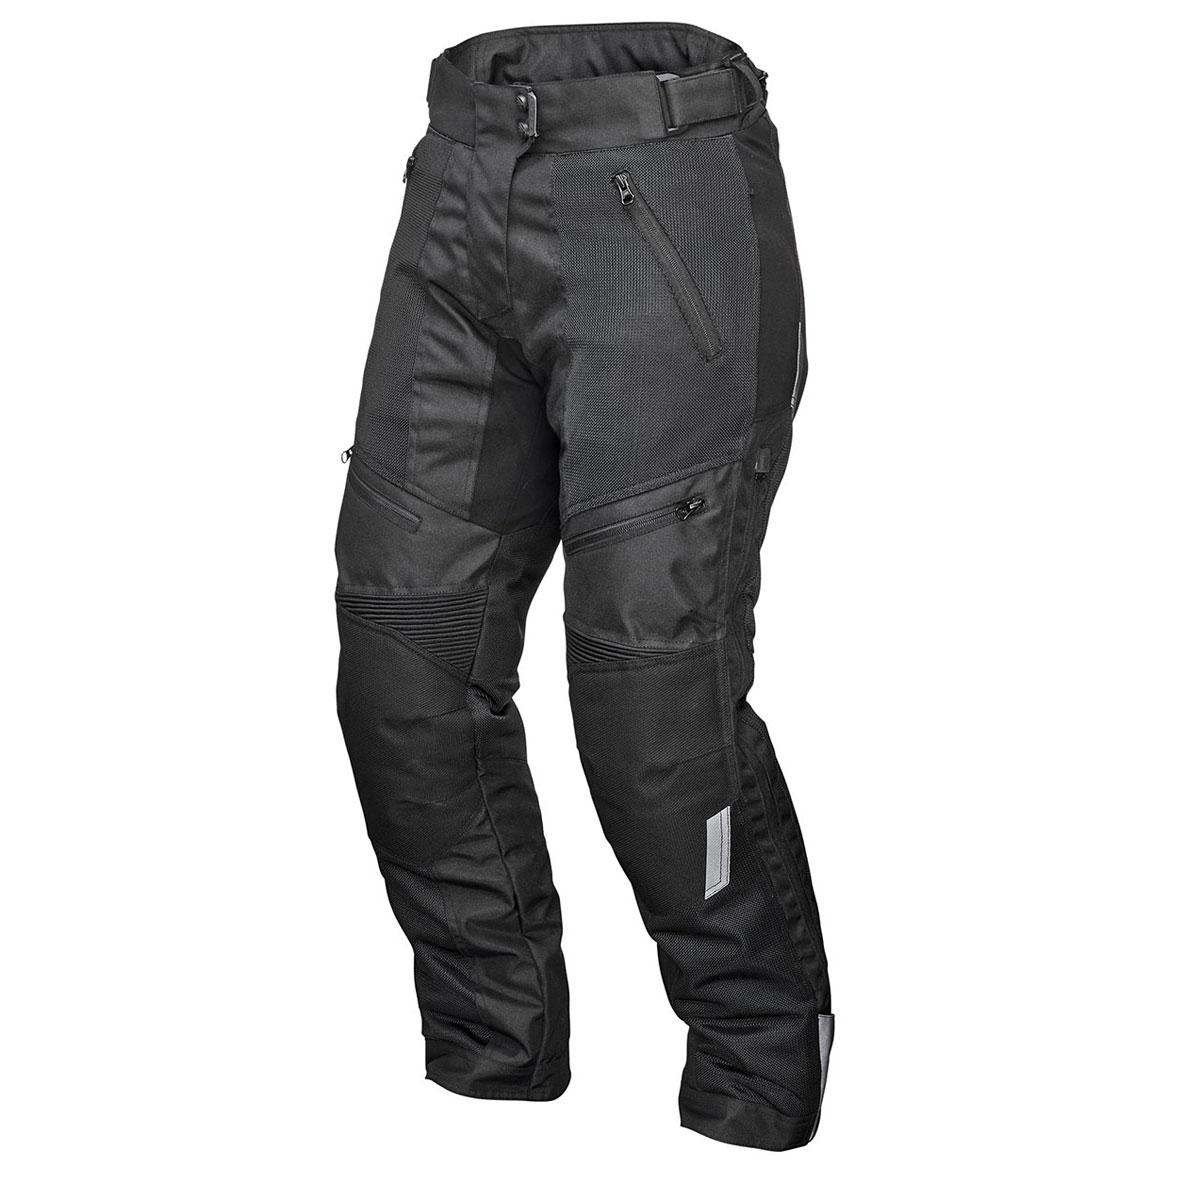 Firstgear Women's Sirocco Mesh Black Overpants